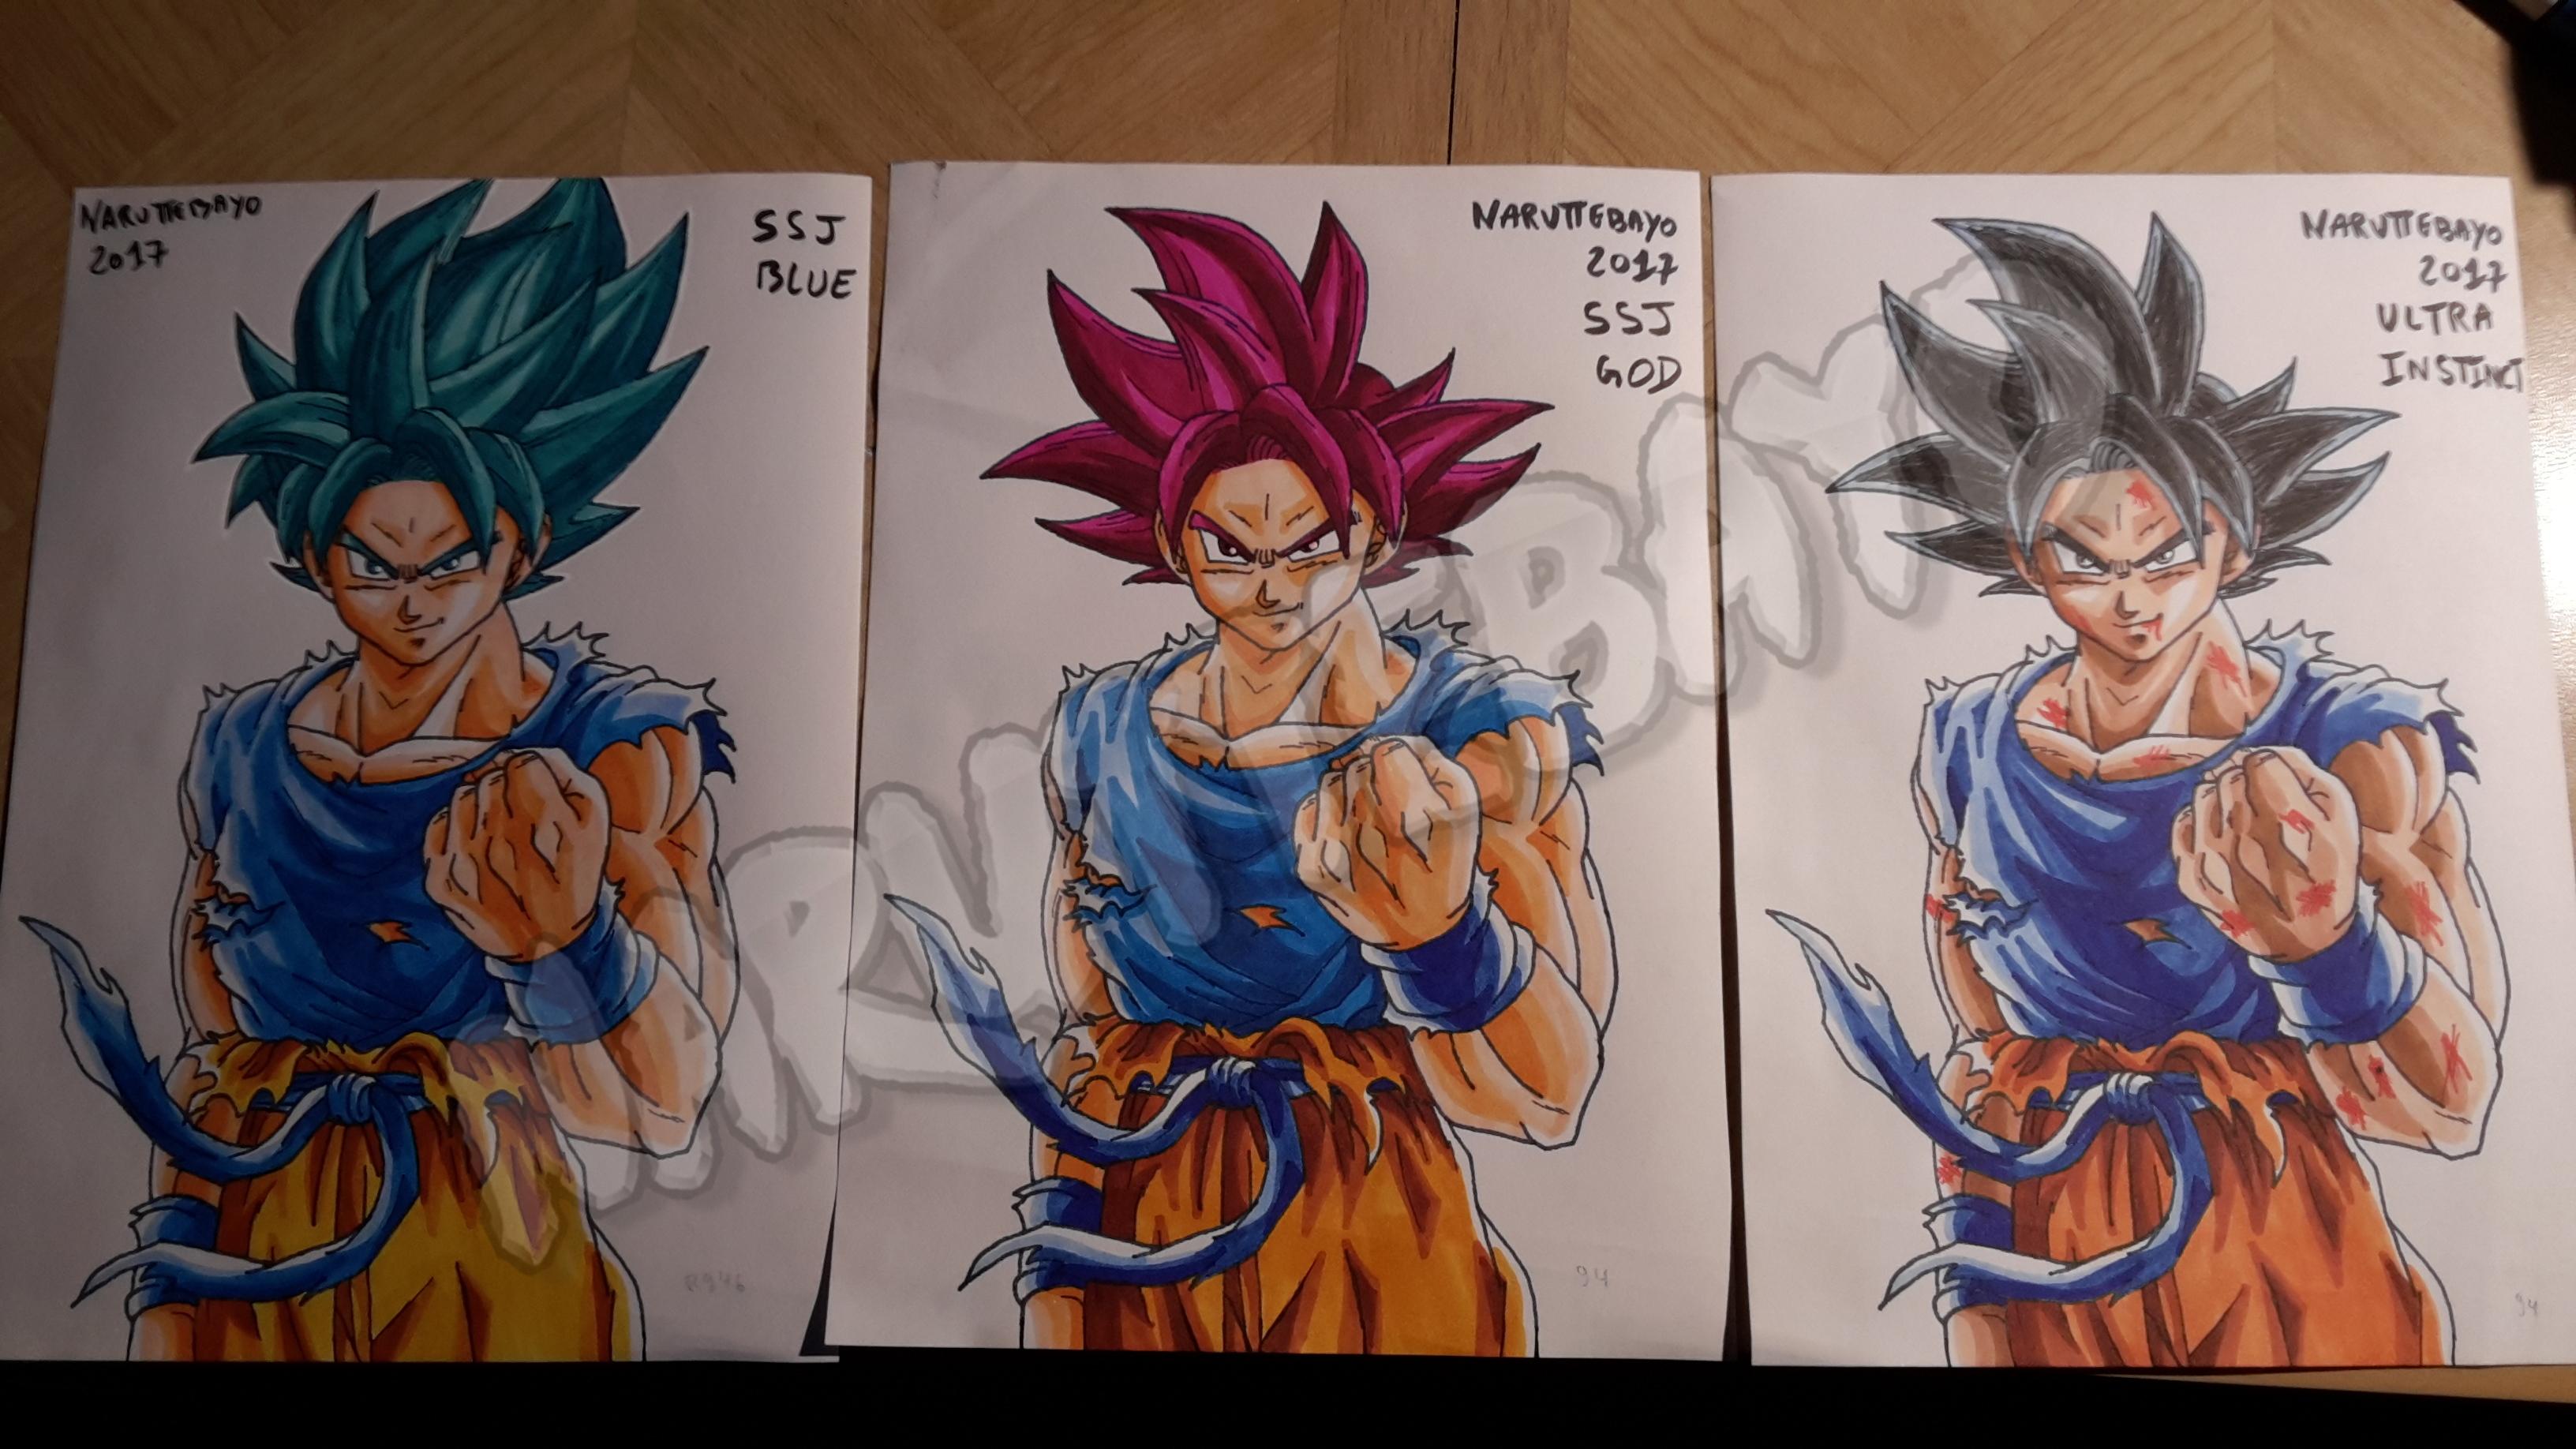 25 12 2017 Goku Blue God Ultra Instinct By Naruttebayo67 On Deviantart